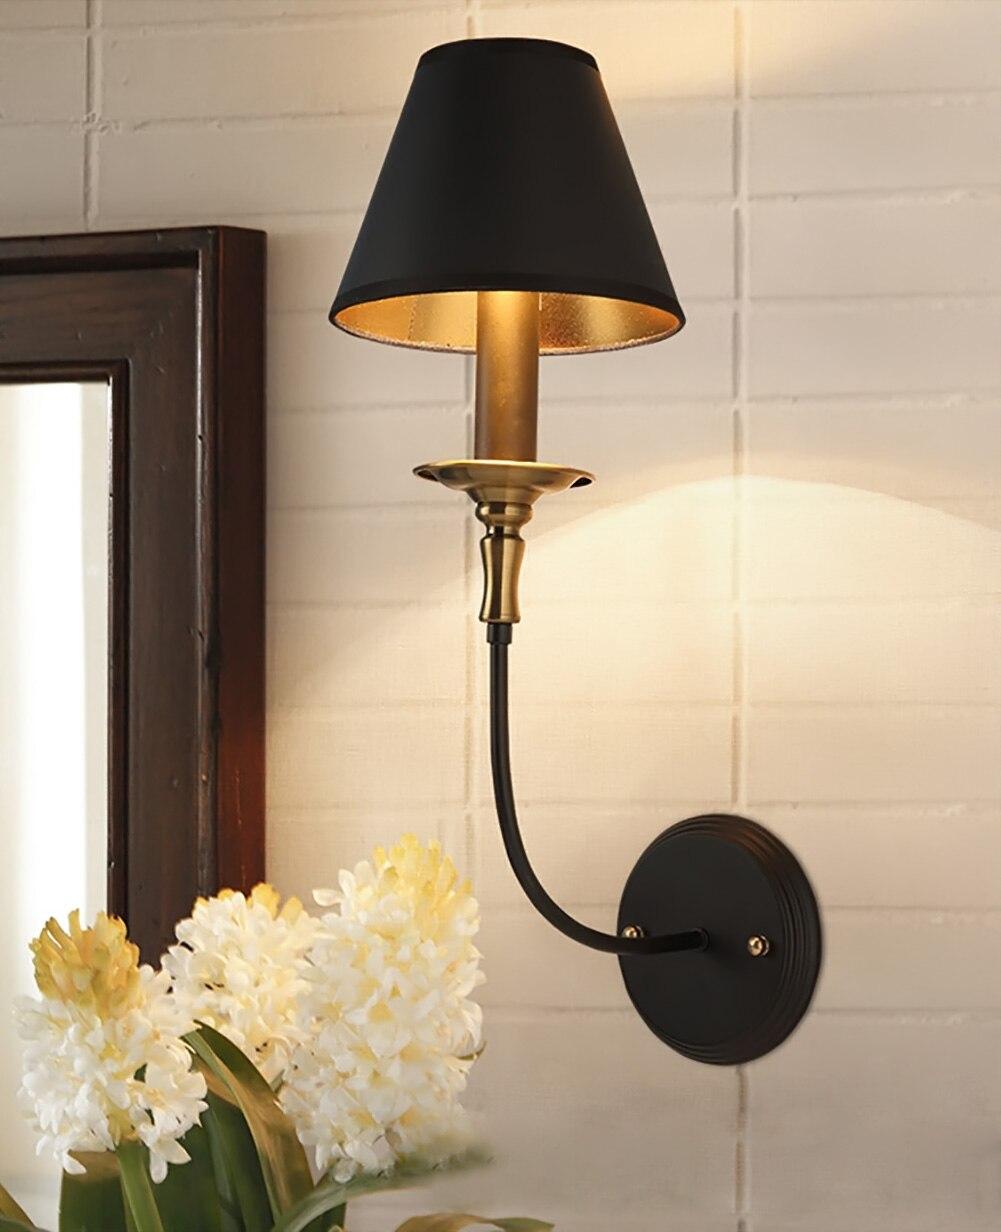 ФОТО Lamp Light American Vintage Industrial Wall Lamp Bedroom Wall Light Bar Decoration Light Coffee Shop Light